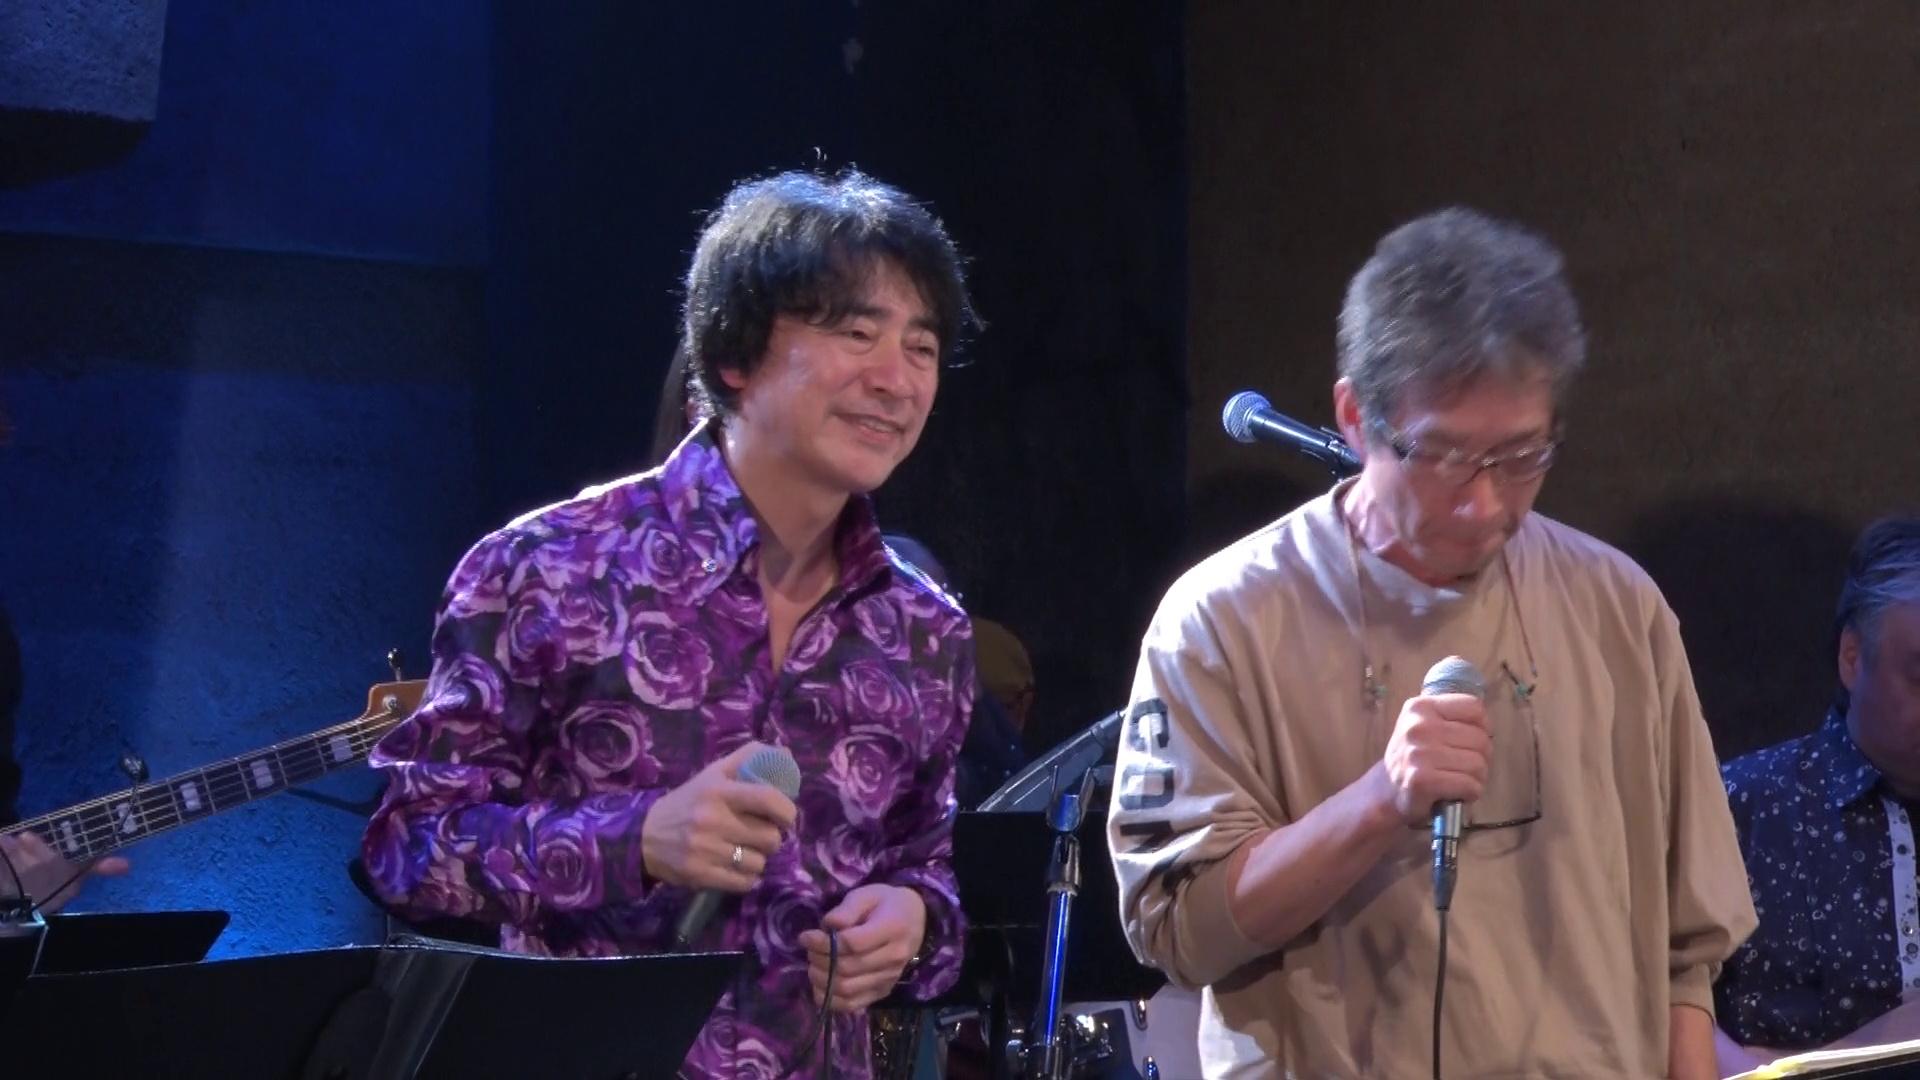 30th Anniversary LIVE 後記 【千沢仁さん】_d0353129_16335851.jpg